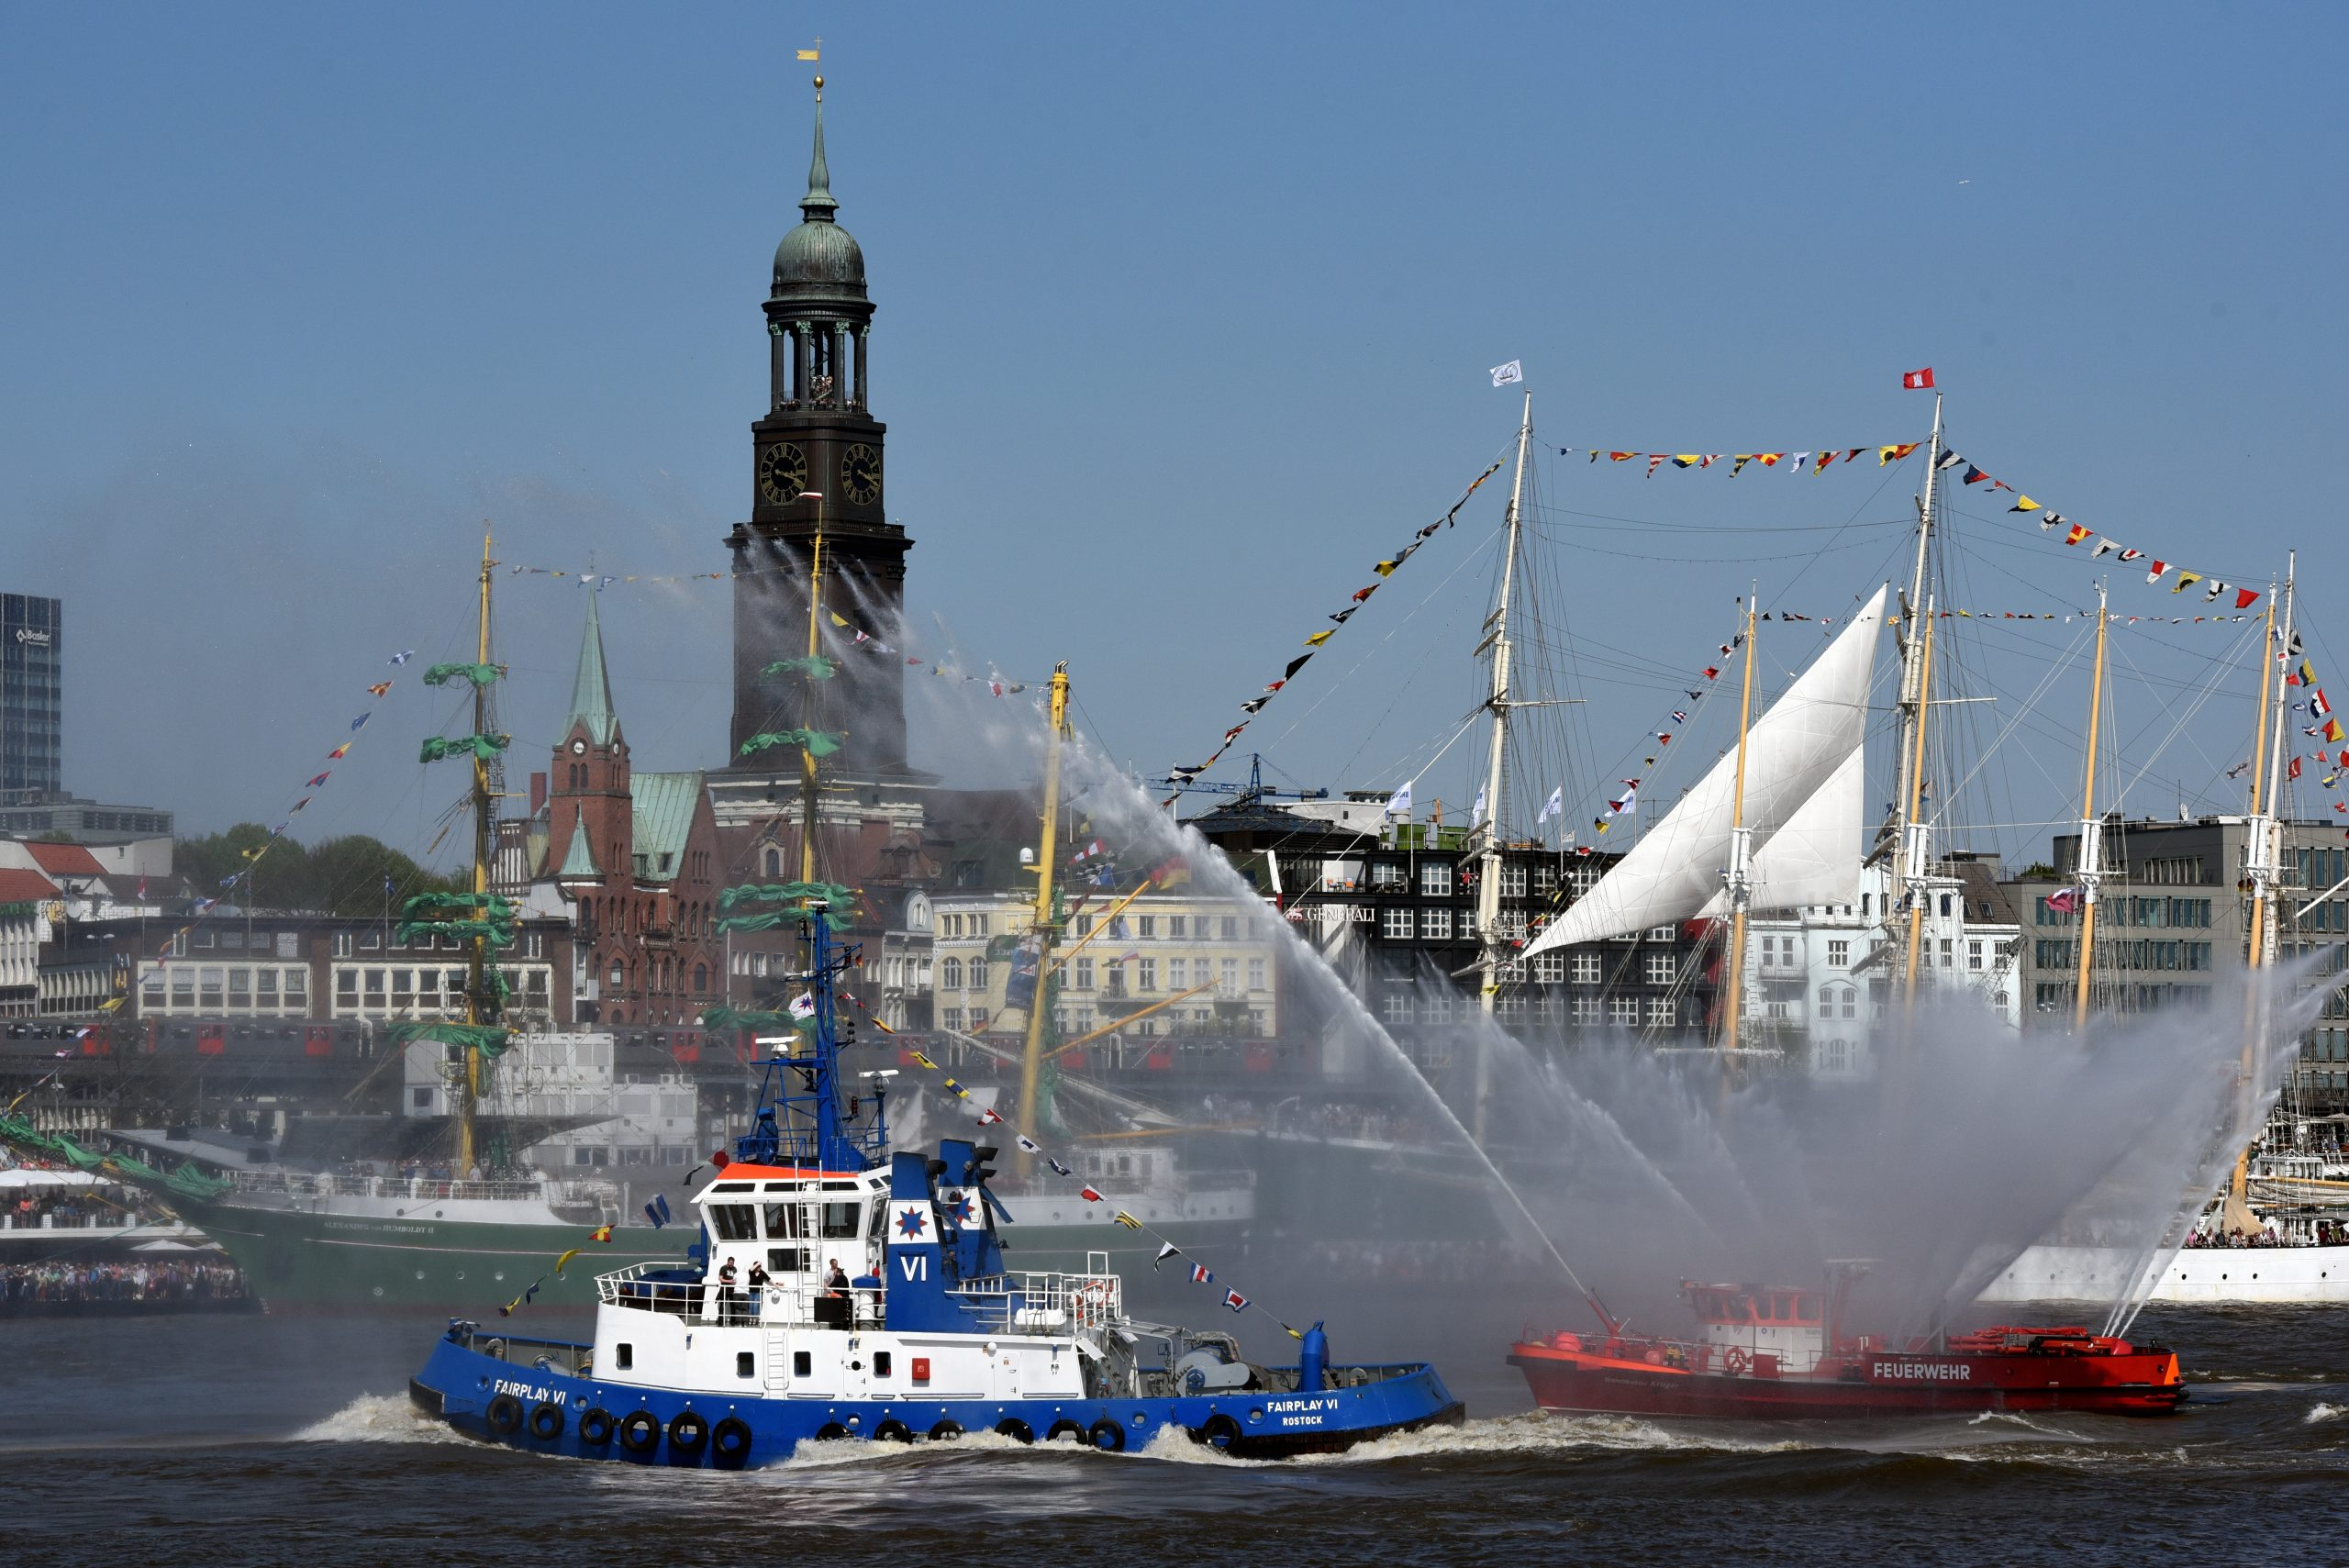 Hamborg, billedet, er sammen med Slesvig-Holsten, Berlin, Niedersachsen og Bayern de fem regioner, danskerne har flest overnatninger i under ophold i Tyskland. Pressefoto Nicolas Maack for DZT, Deutsche Zentrale für Tourismus.